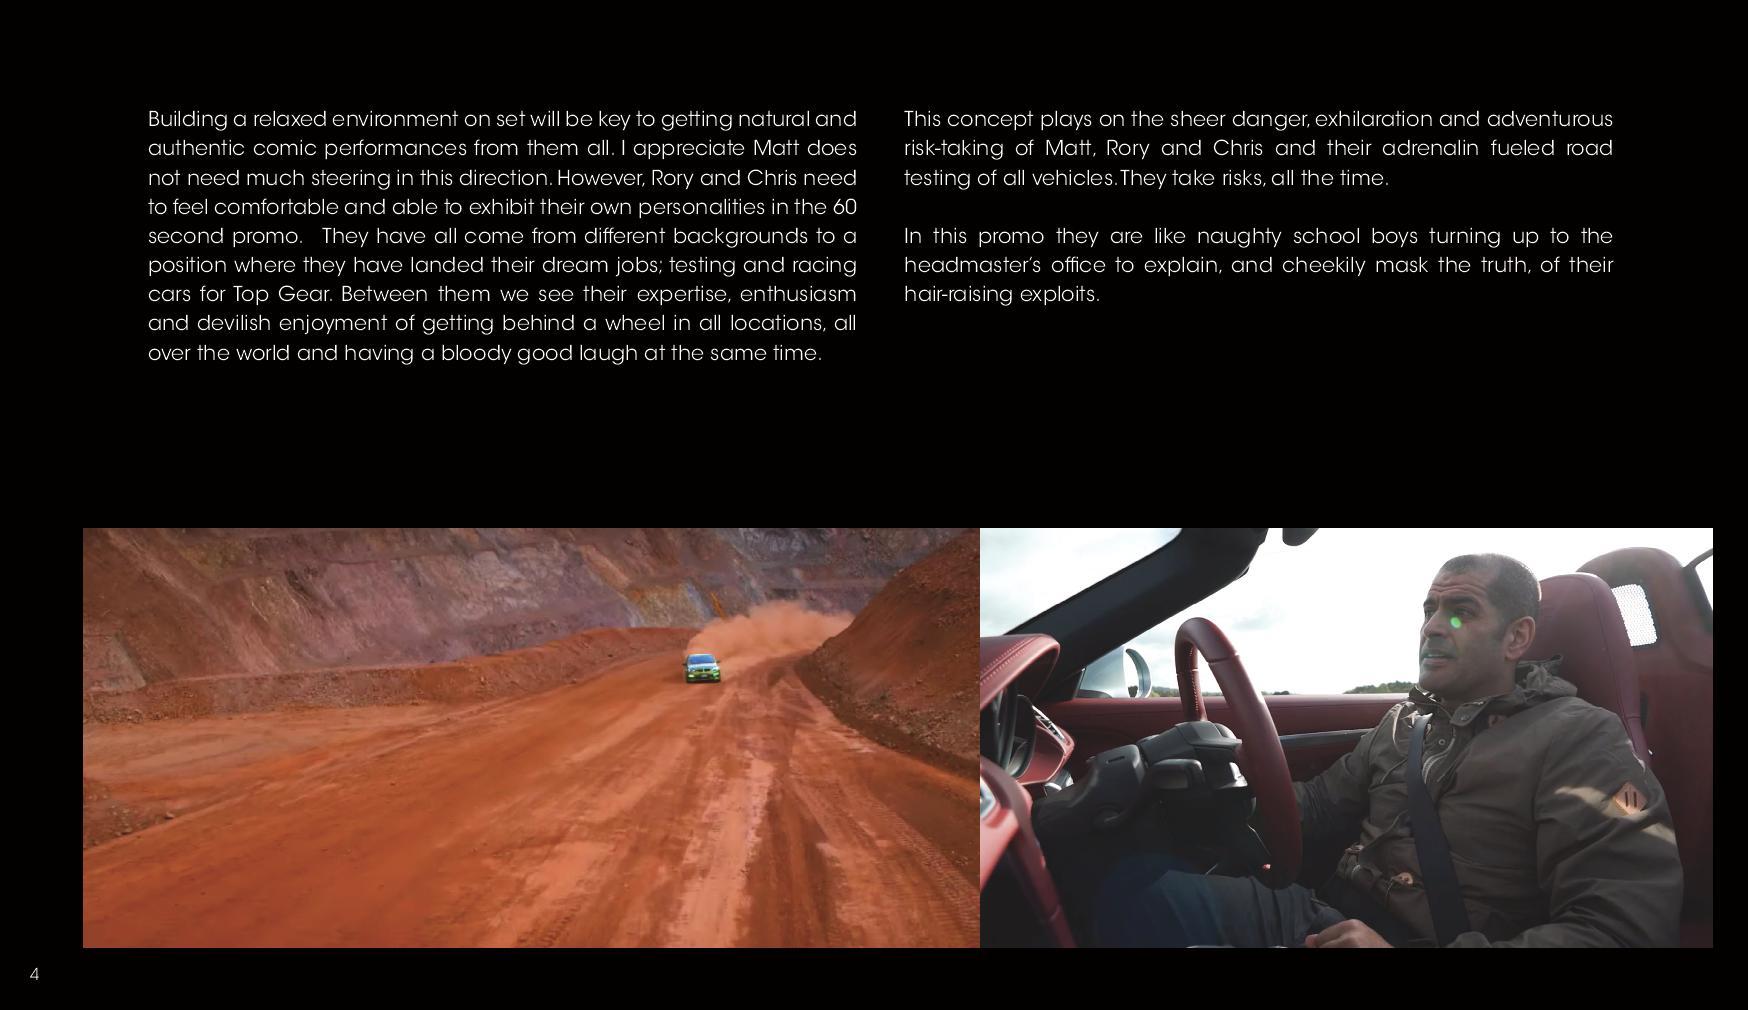 Top Gear-page-004.jpg